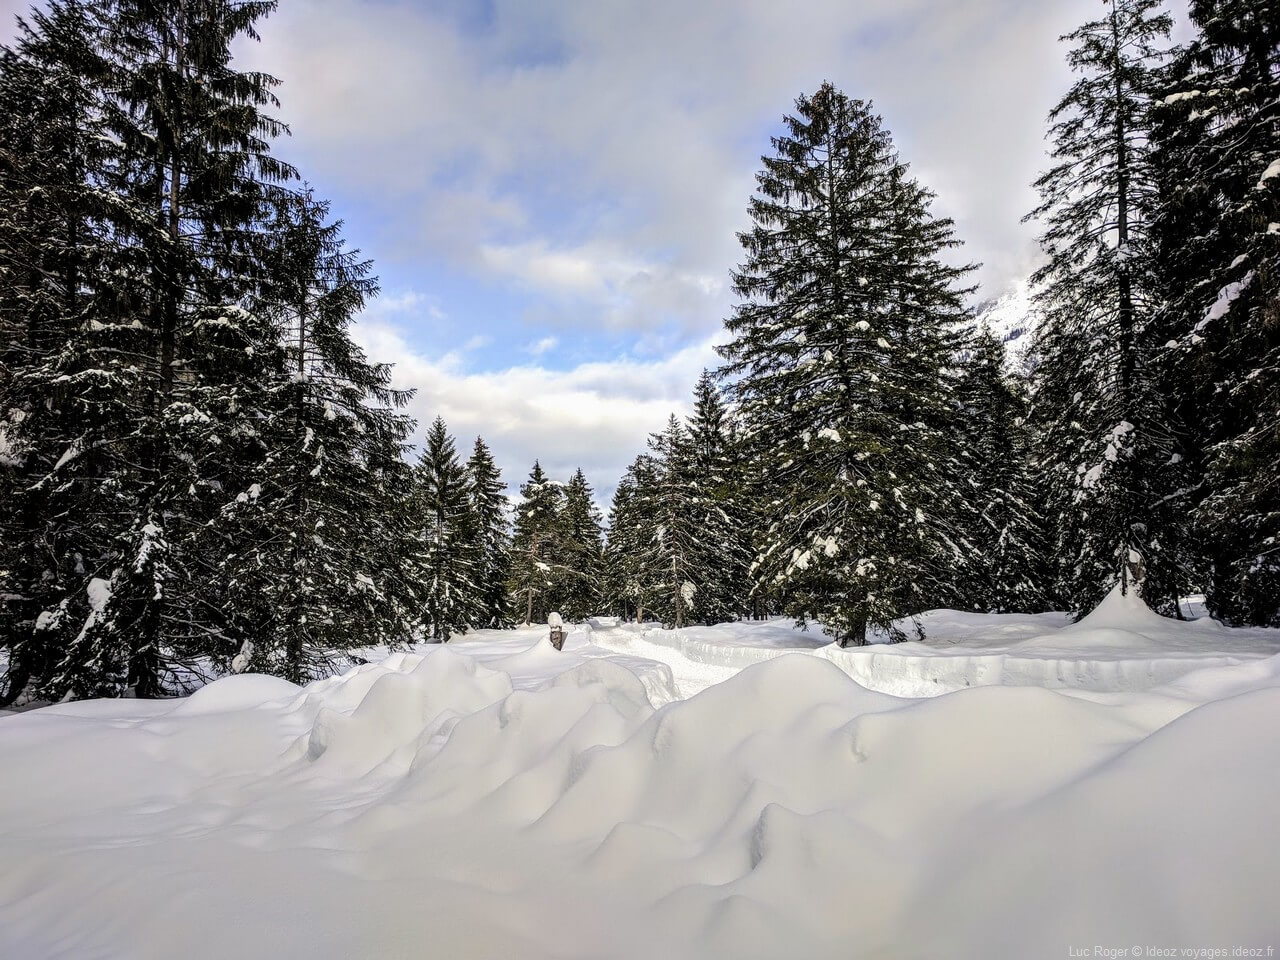 Neige abondante dans les massifs de Mittenwald Riedboden